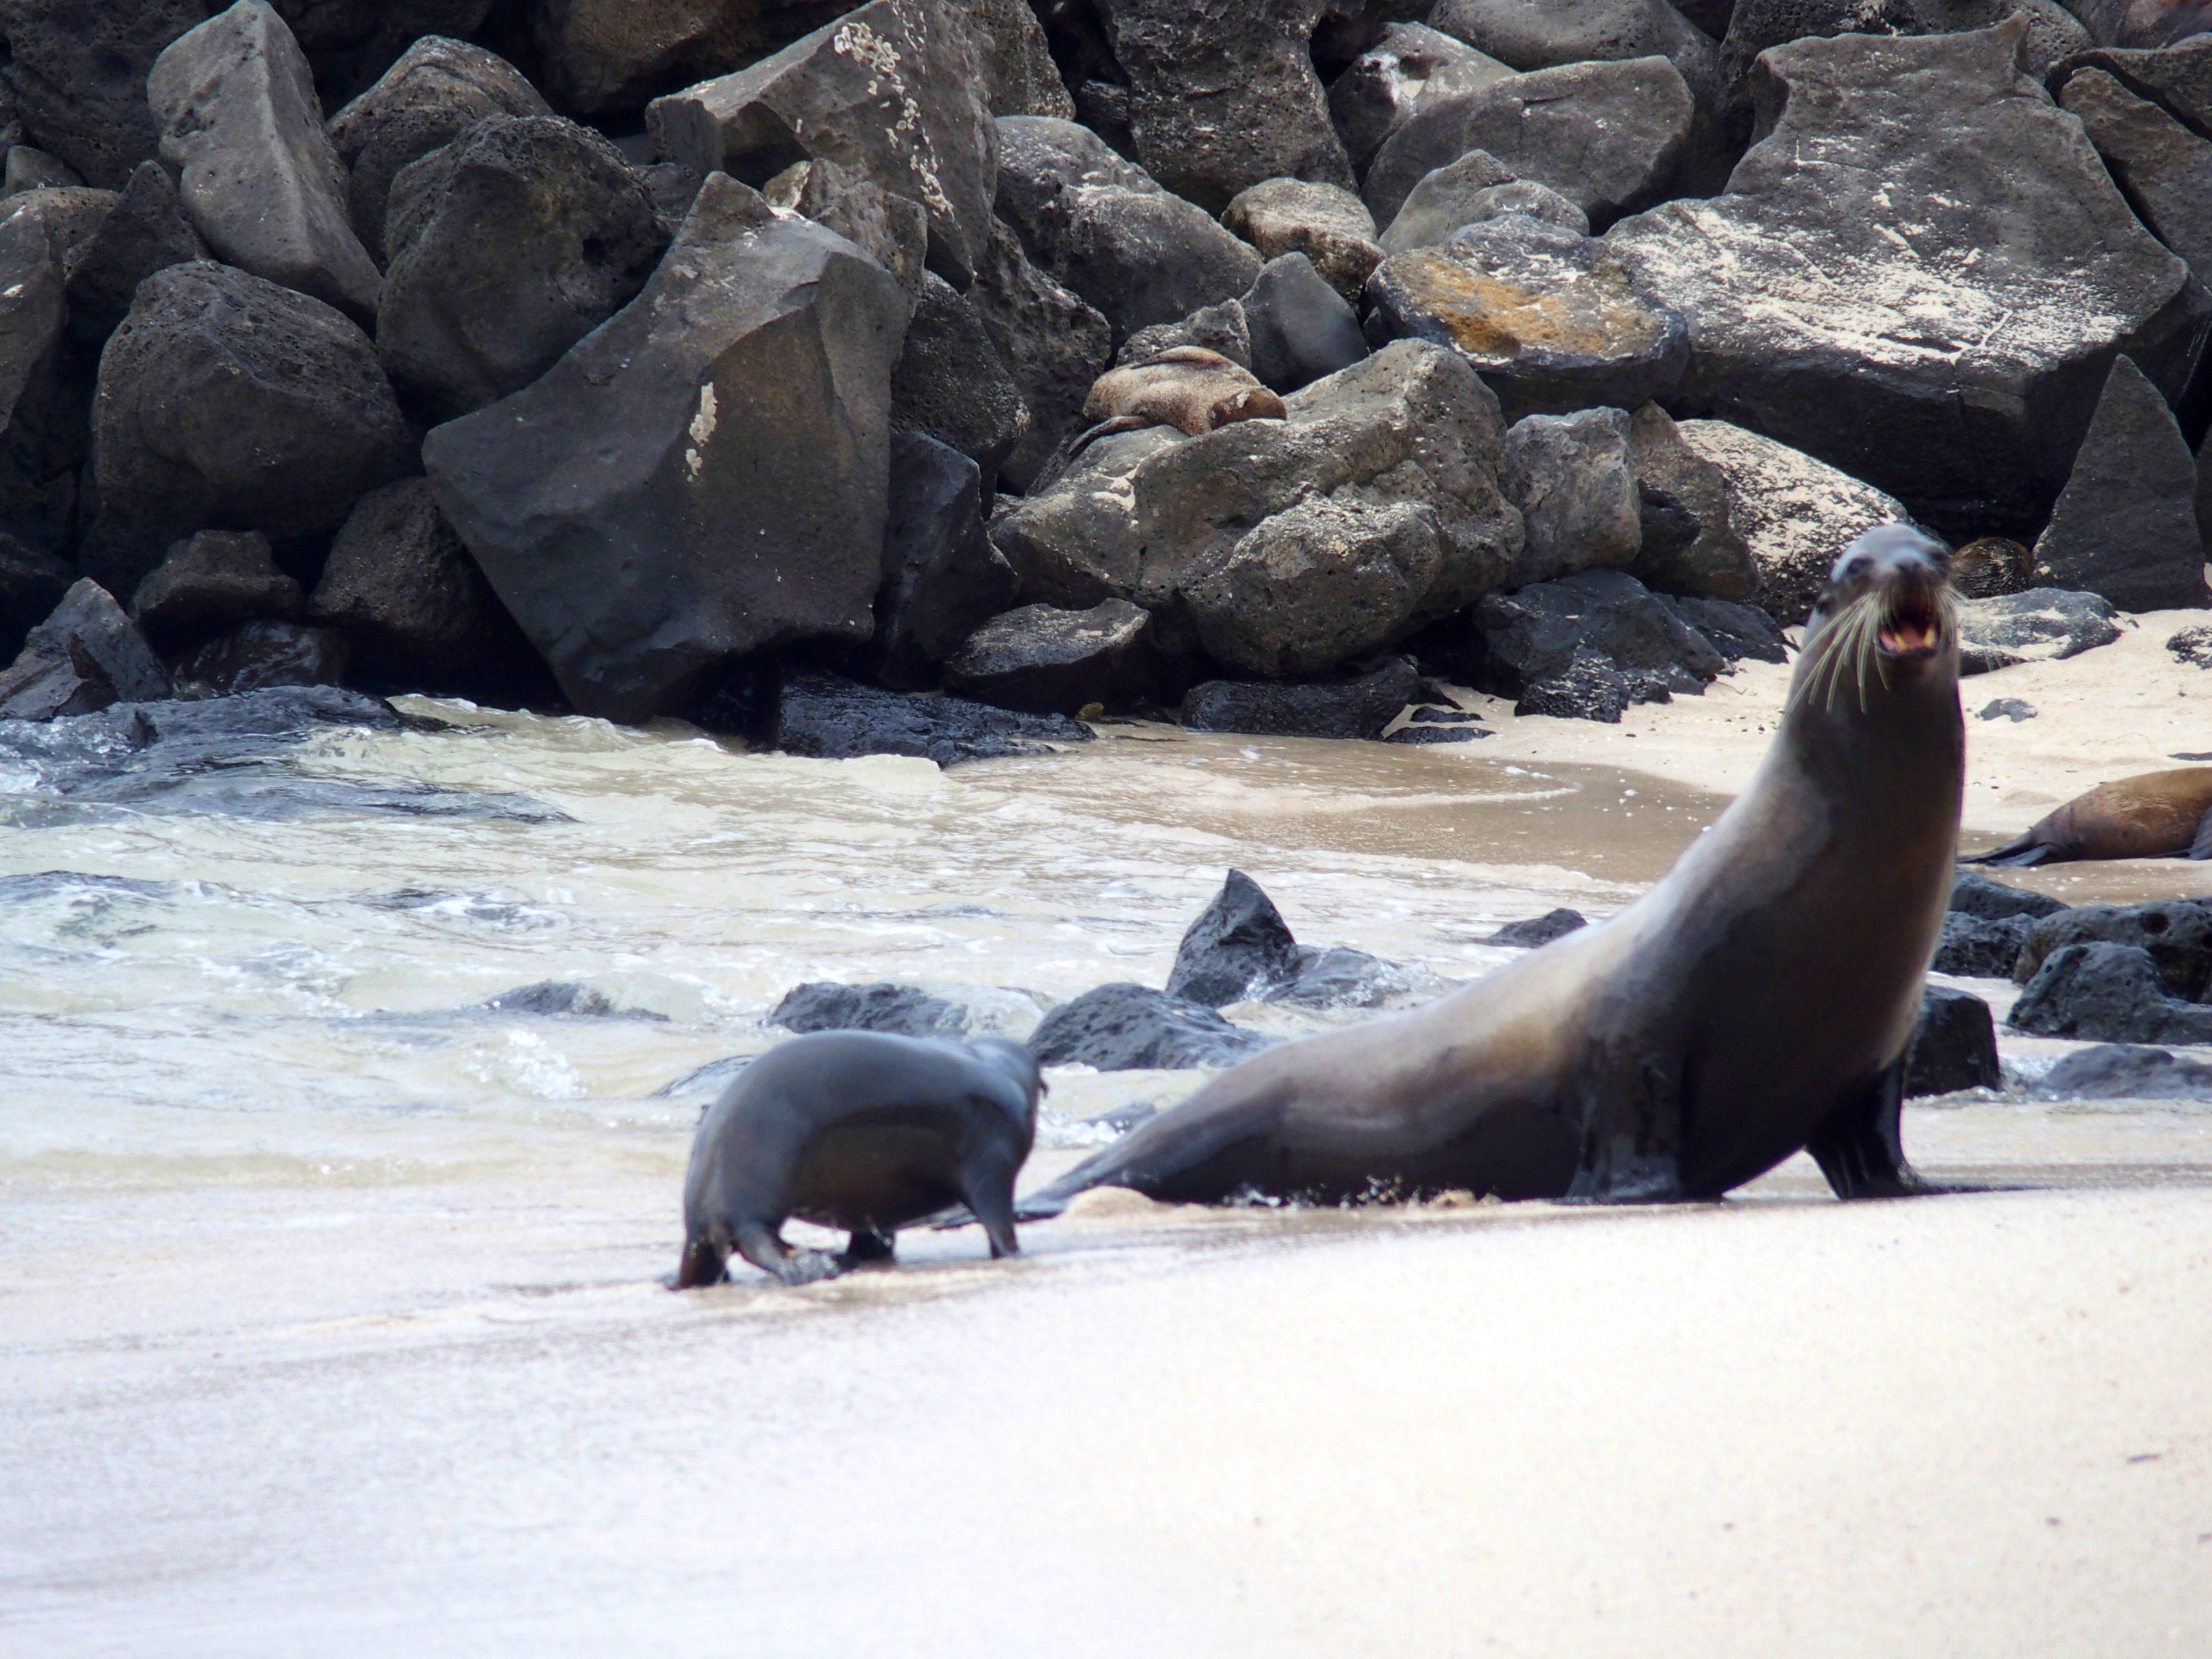 Maman otarie qui protège son petit - Galapagos